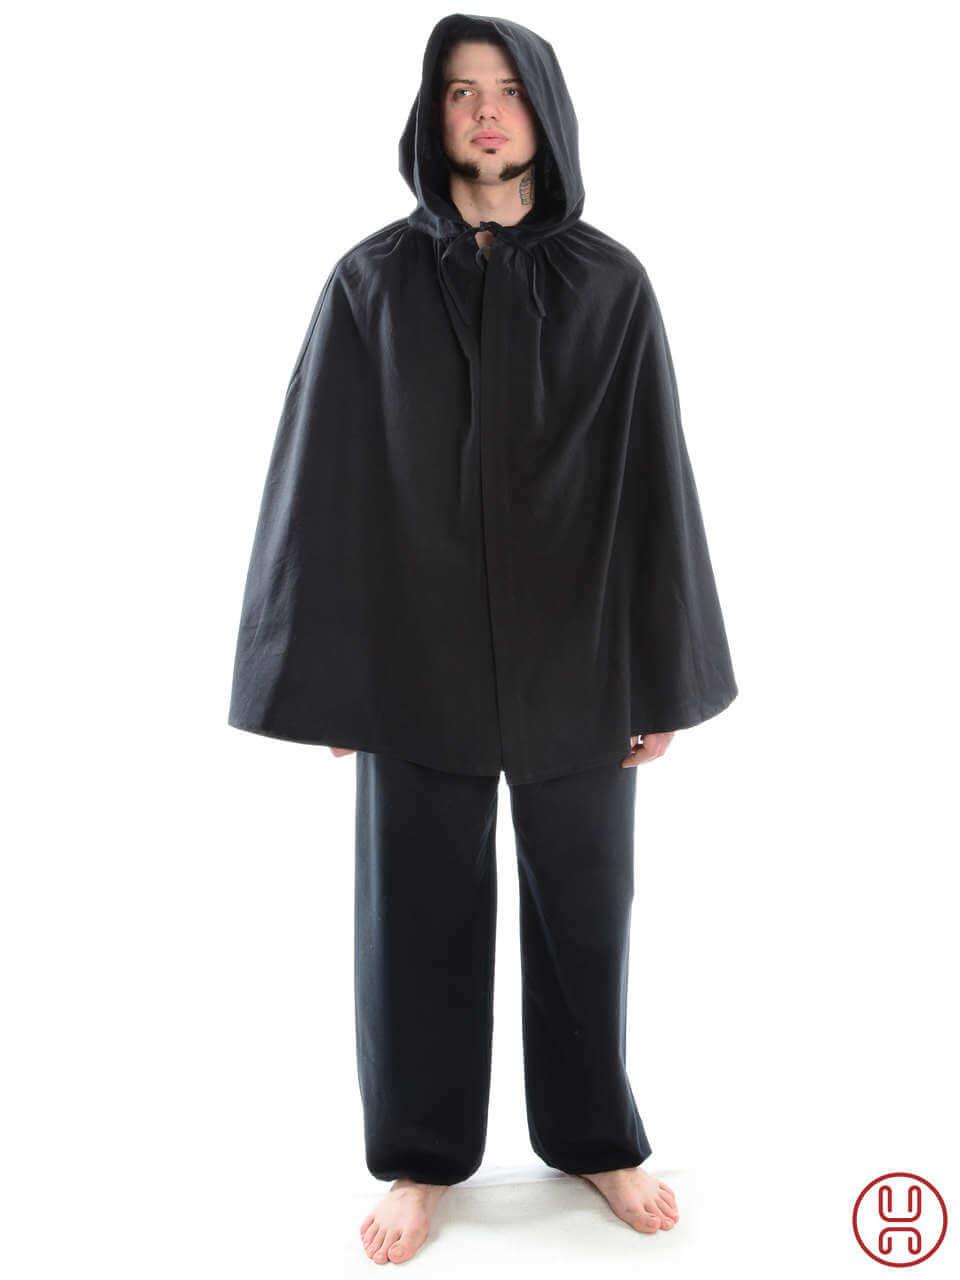 aa8273a862ac Medieval Cloak short